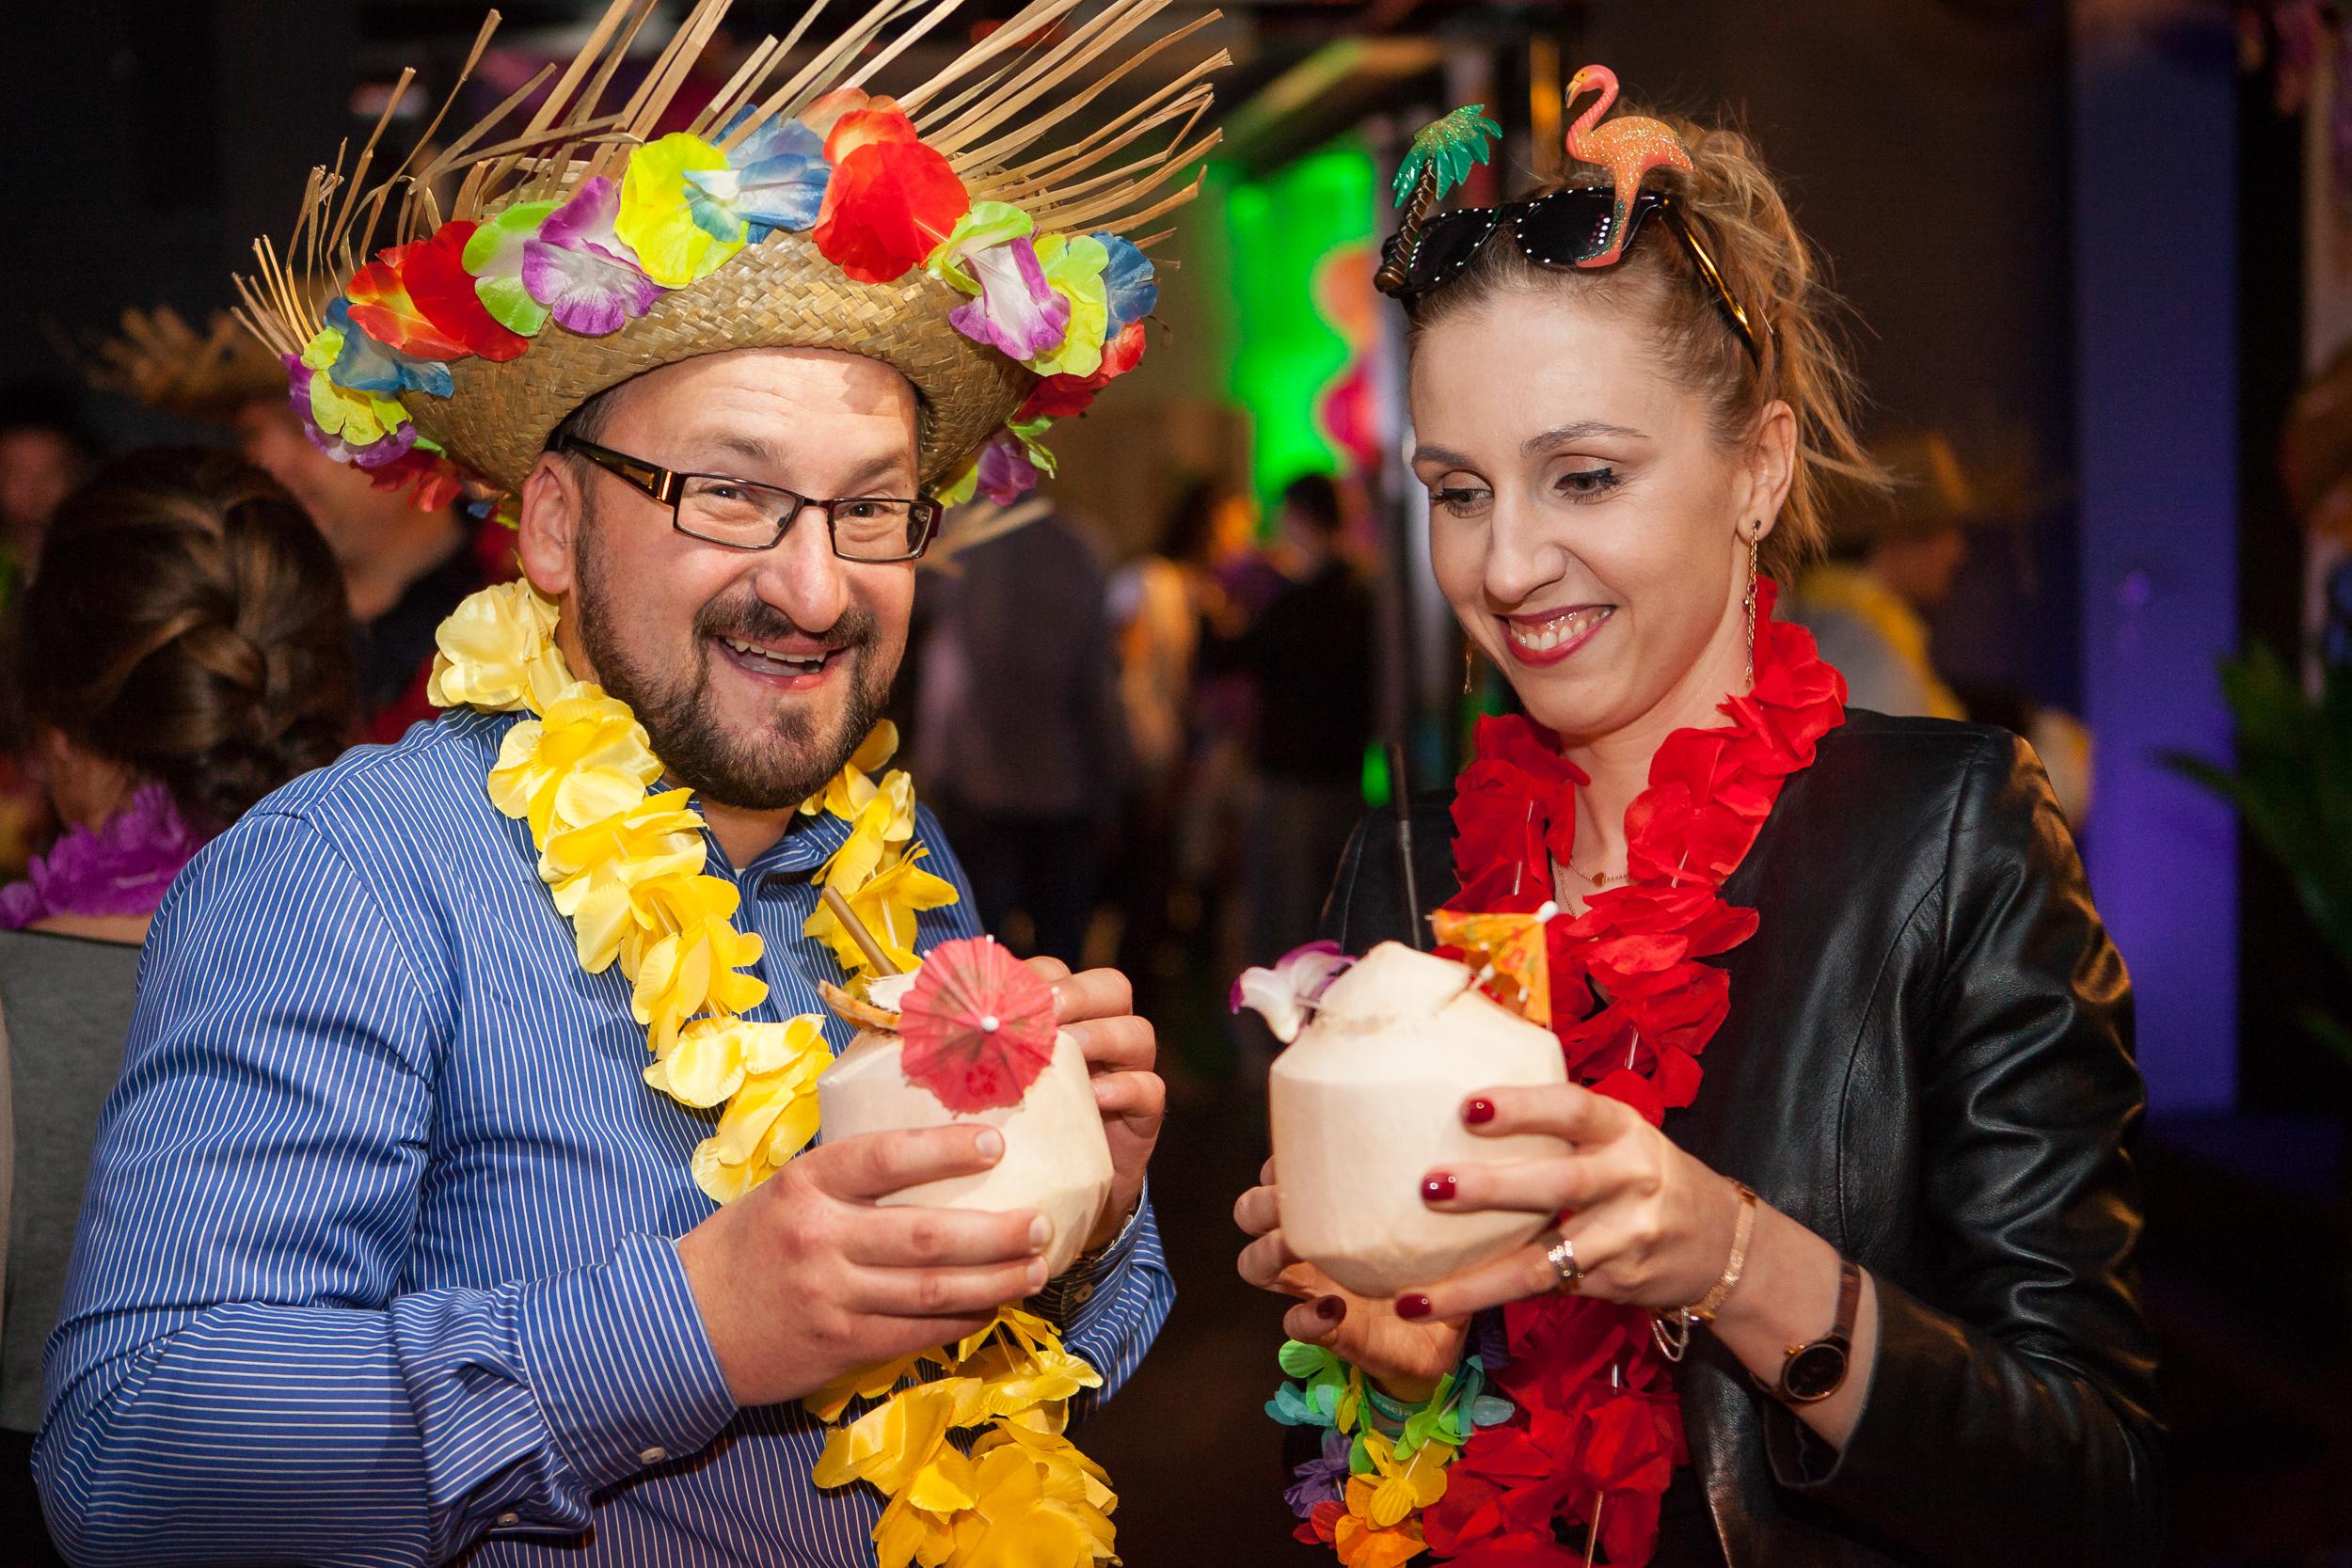 Hawajska Noc - impreza integracyjna